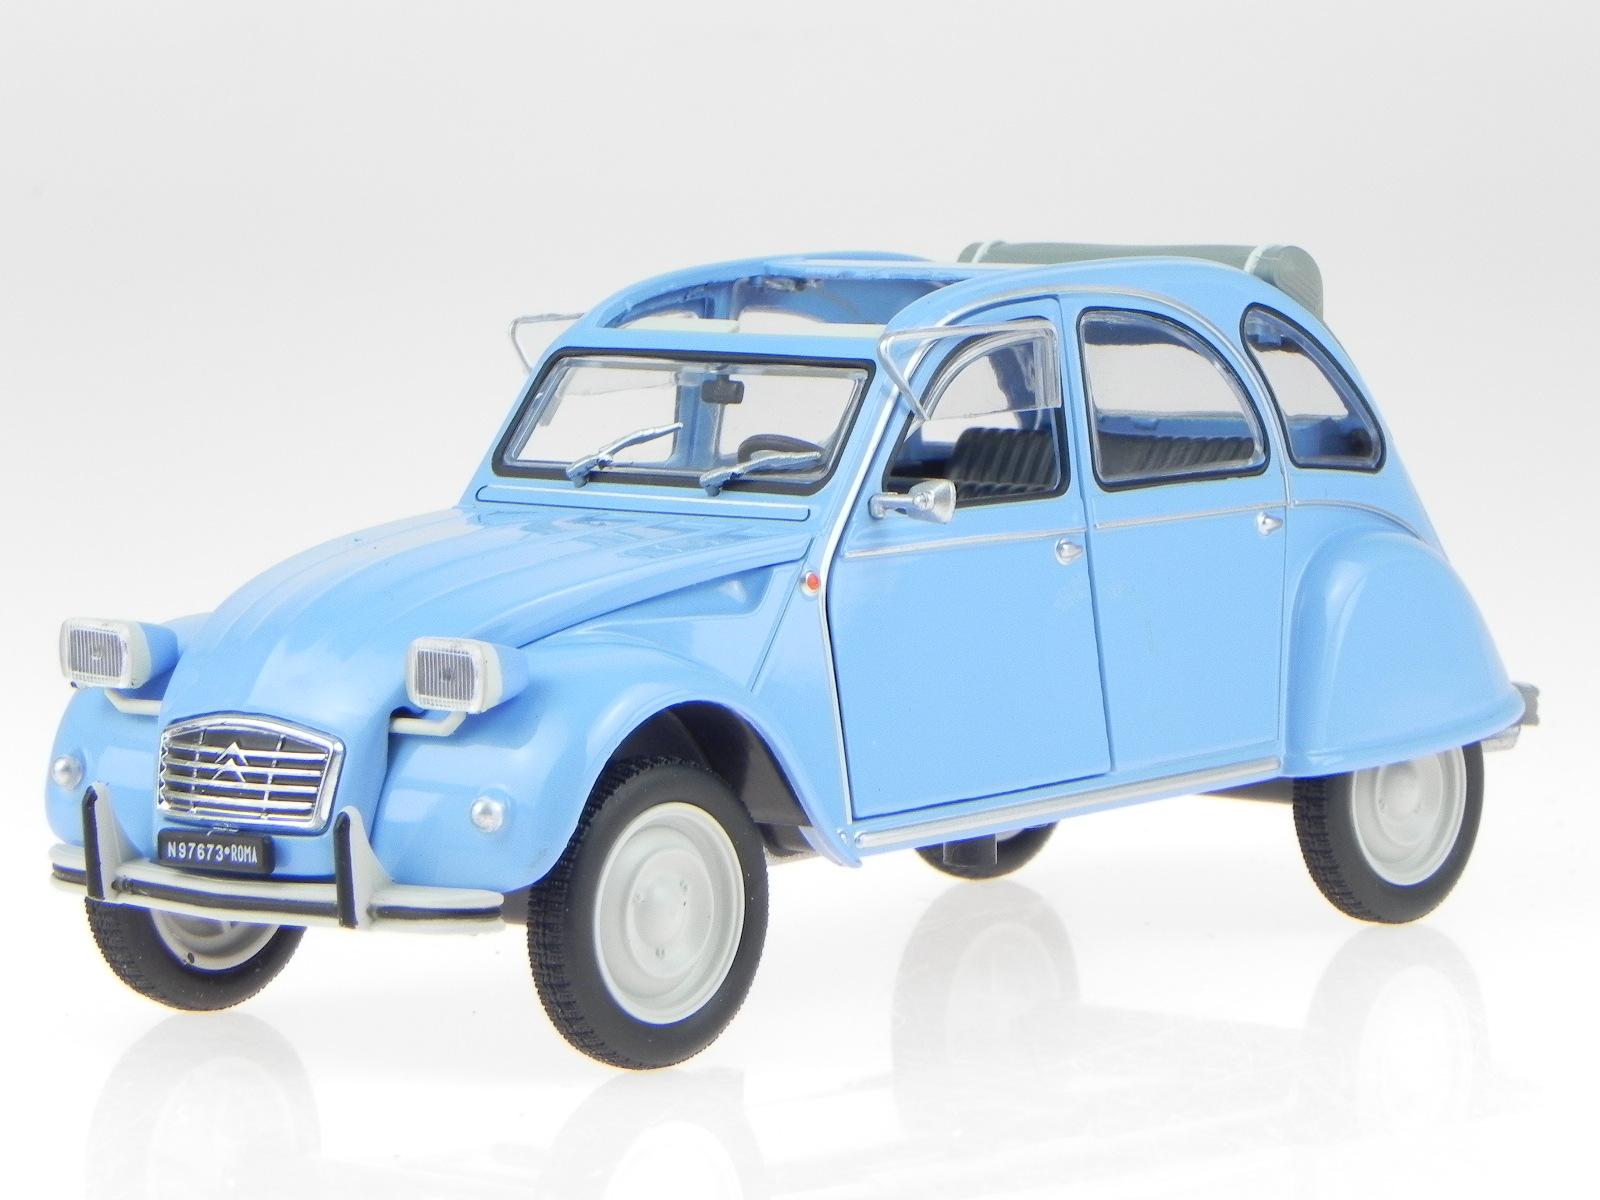 citroen 2cv 2 cv 4 ente 1976 blue modelcar leo 1 24 4058124200499 ebay. Black Bedroom Furniture Sets. Home Design Ideas